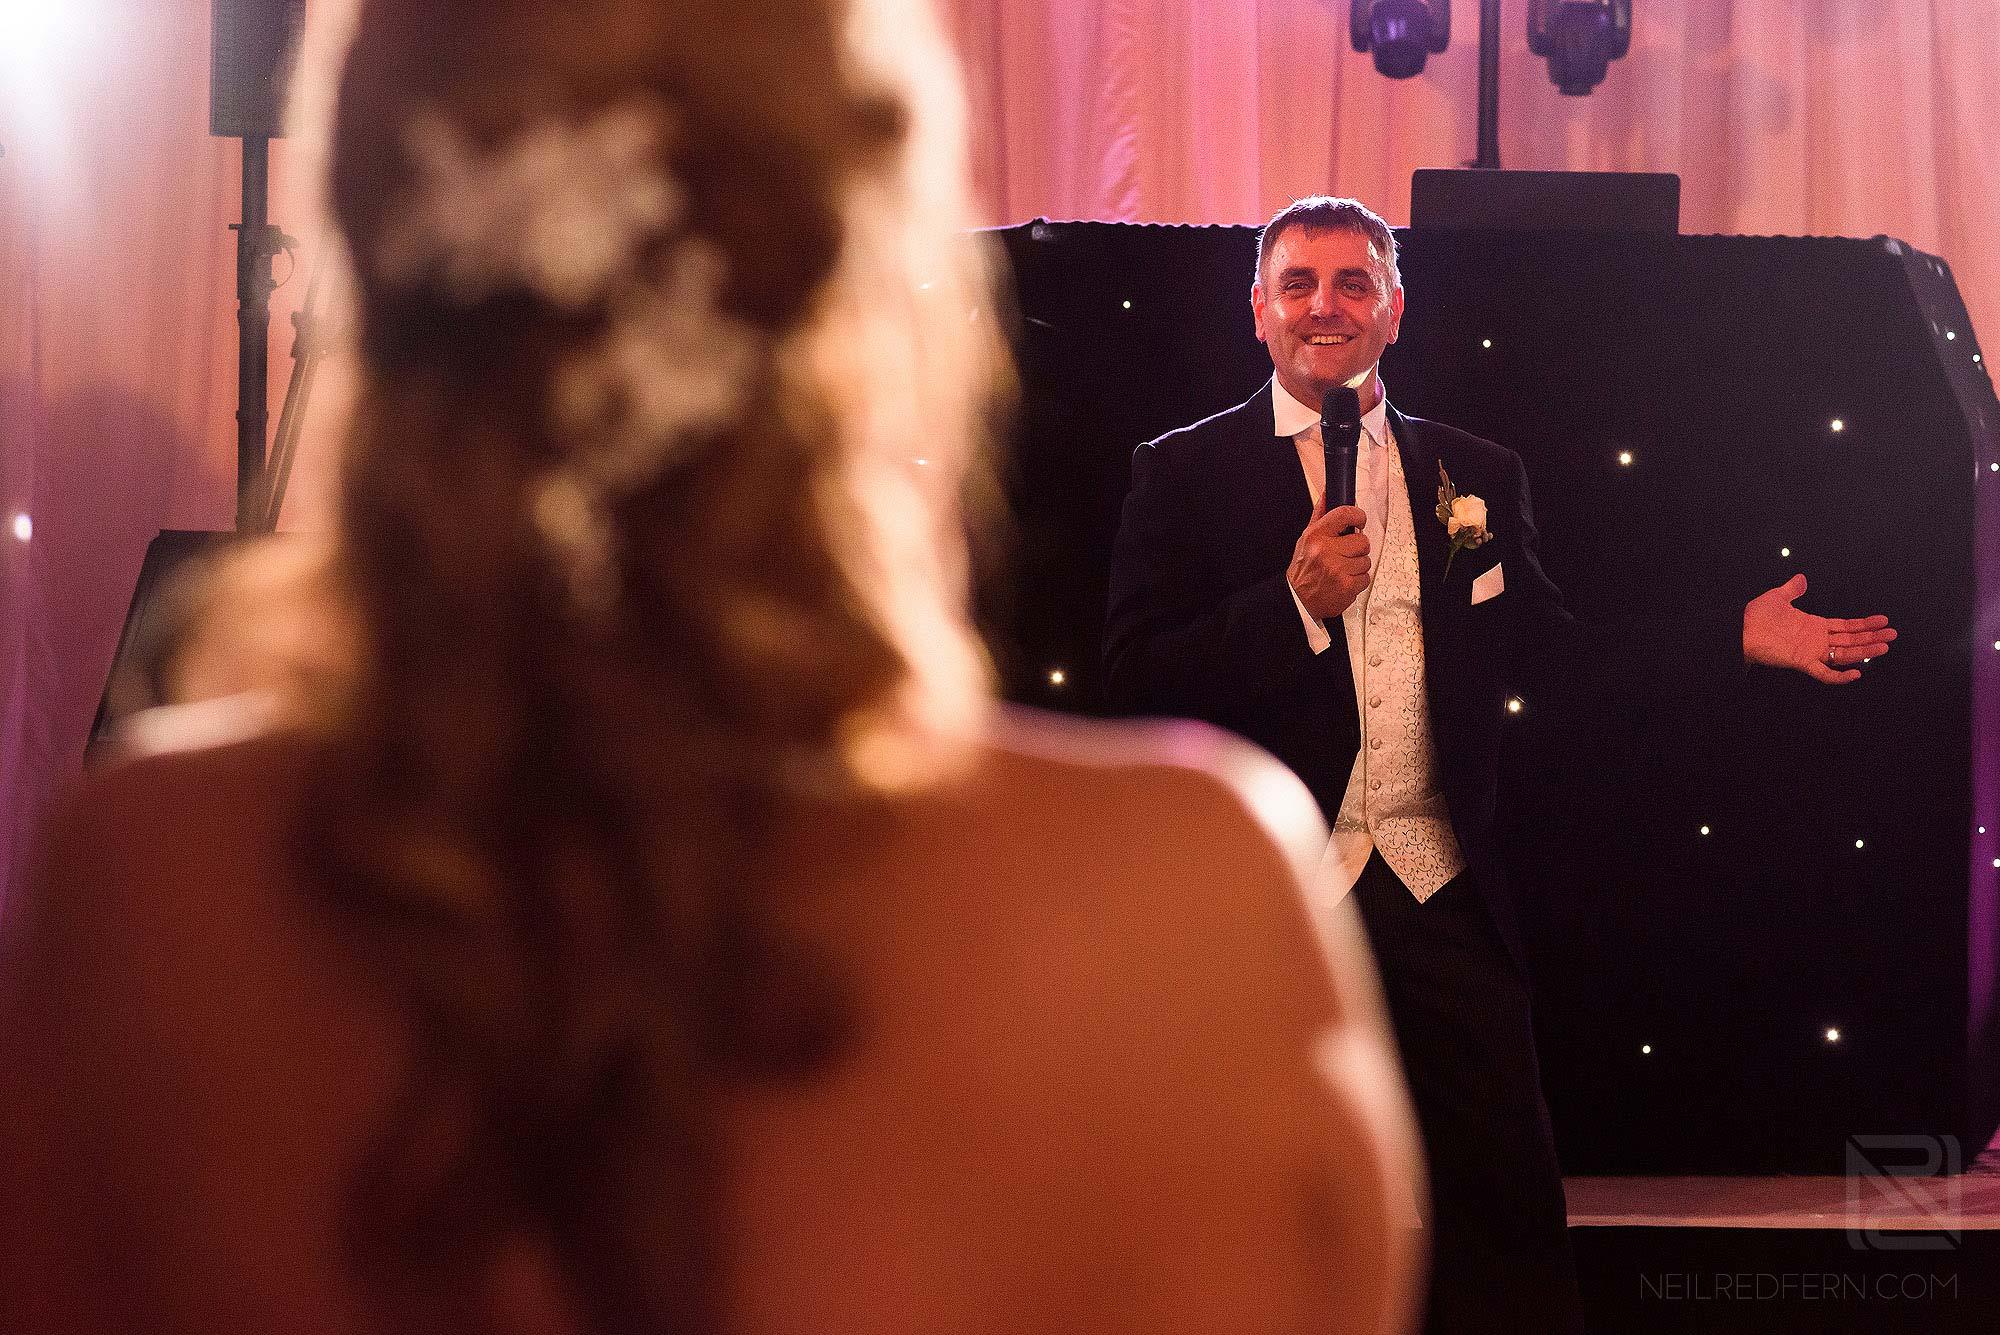 groom singing to bride during wedding reception